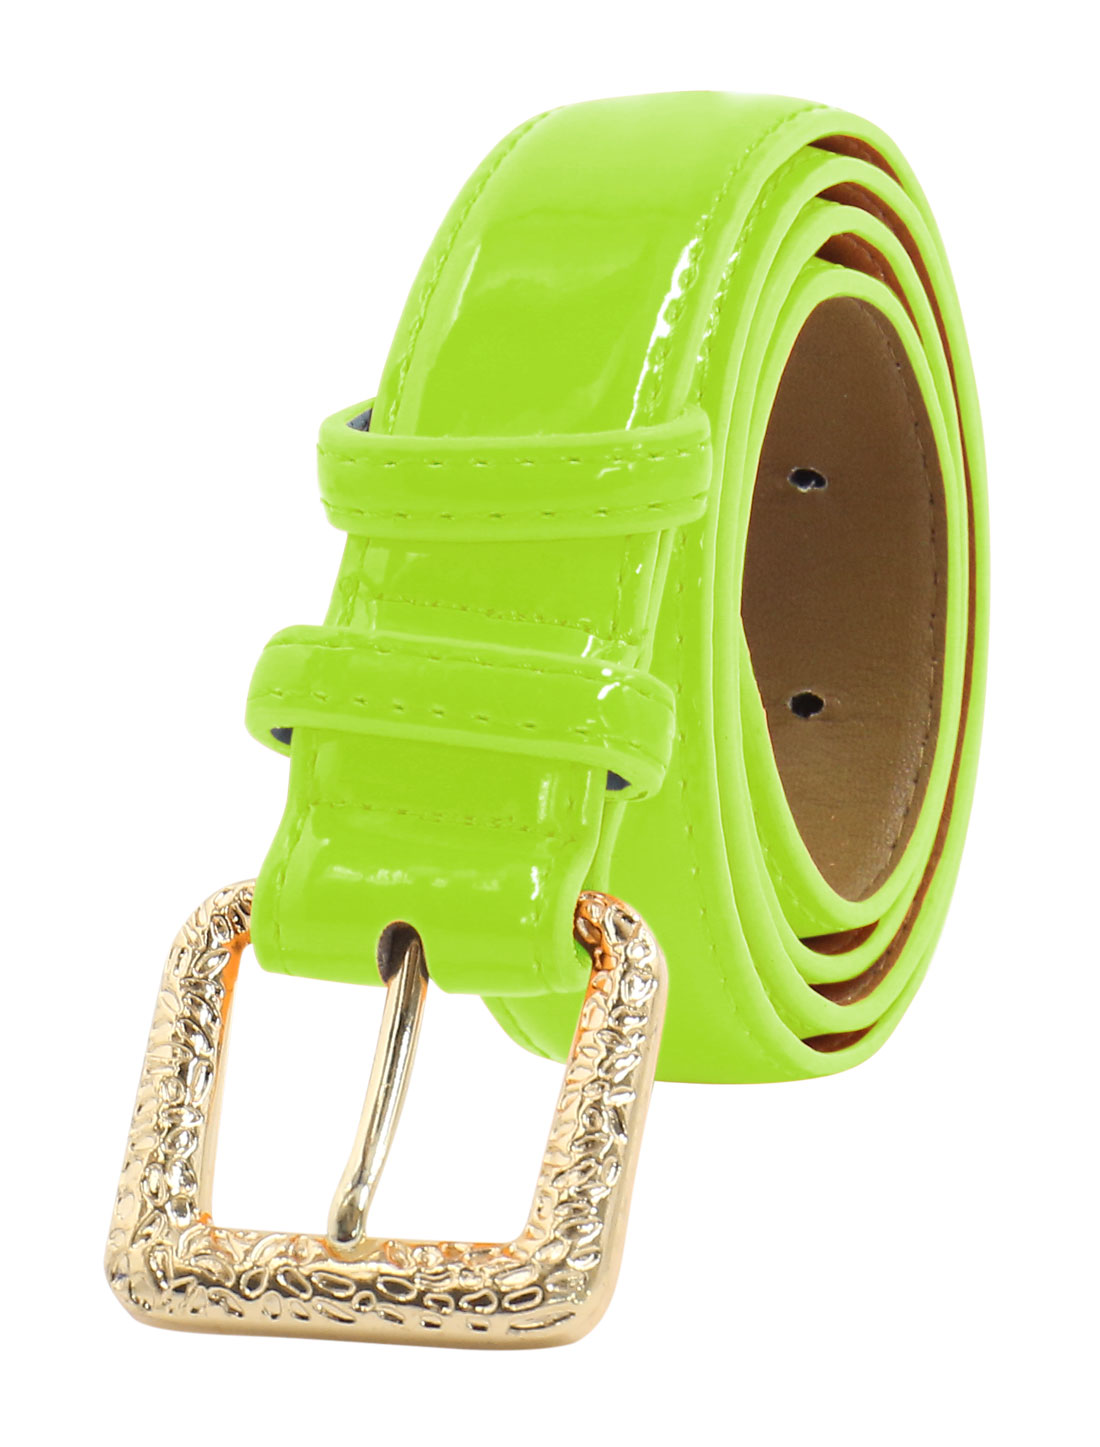 Women Adjustable Single Pin Buckle PU Waist Belt Green